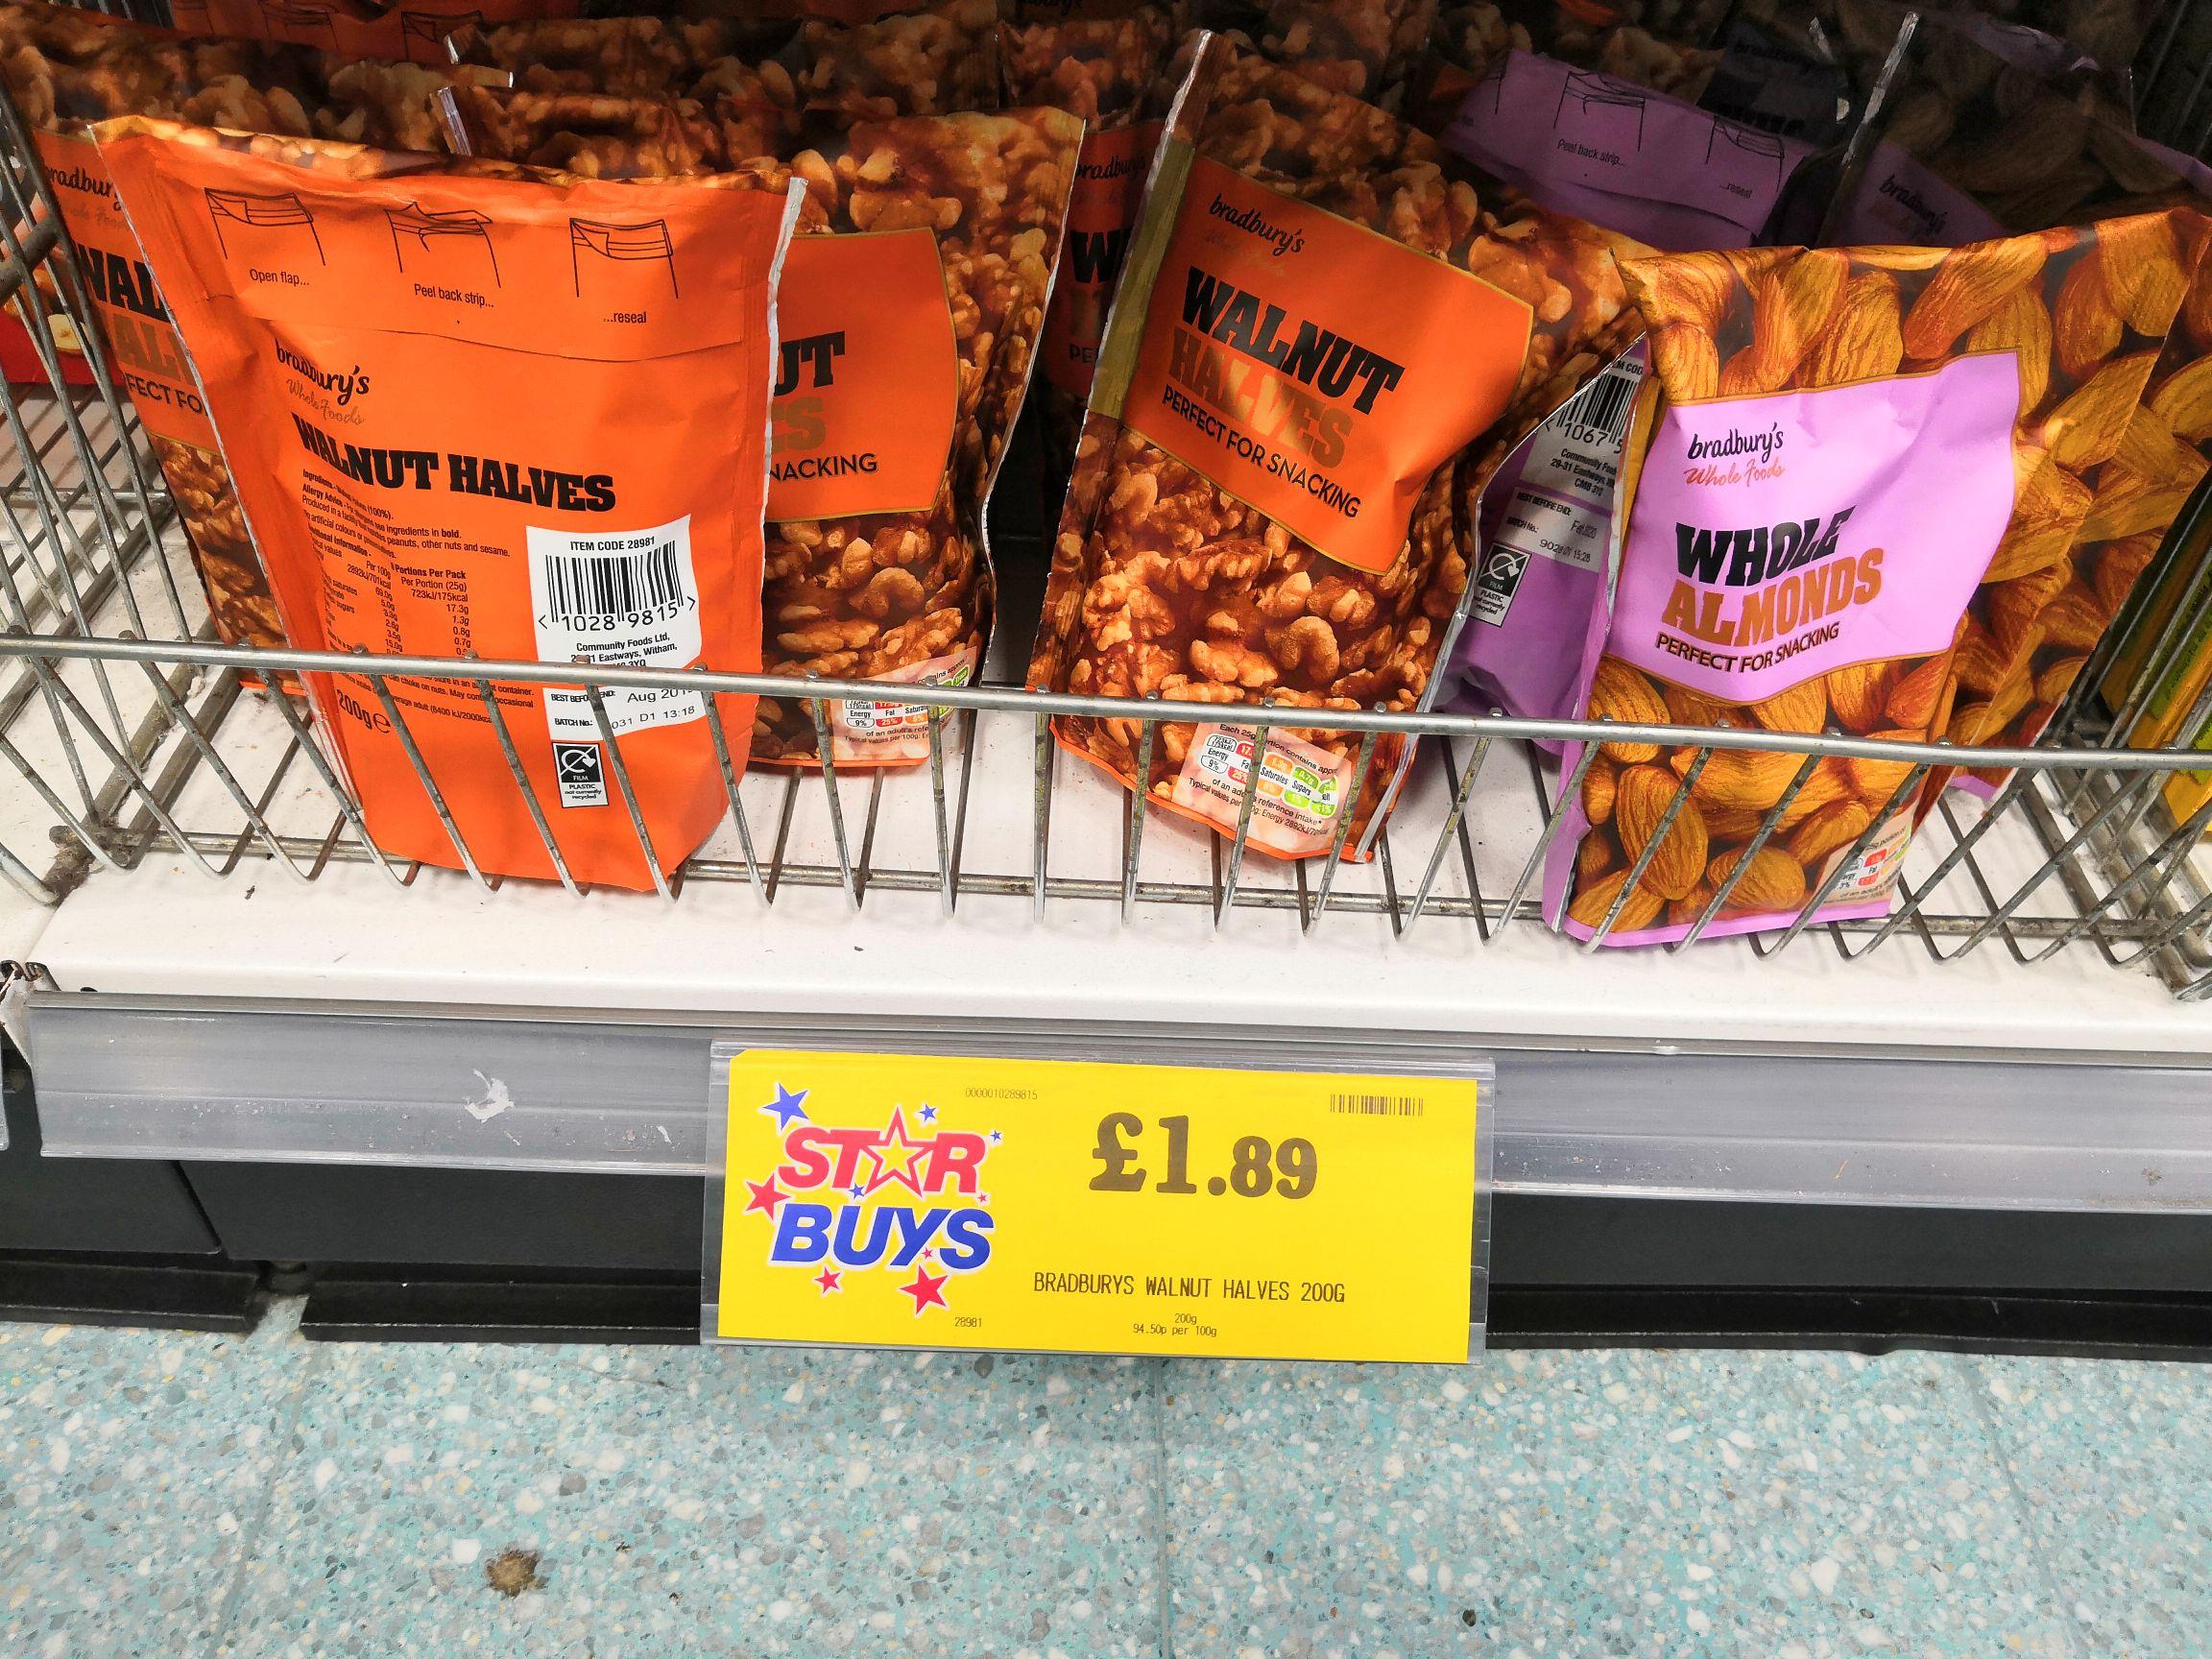 200g Almond or walnut halves £1.89 at Home Bargains